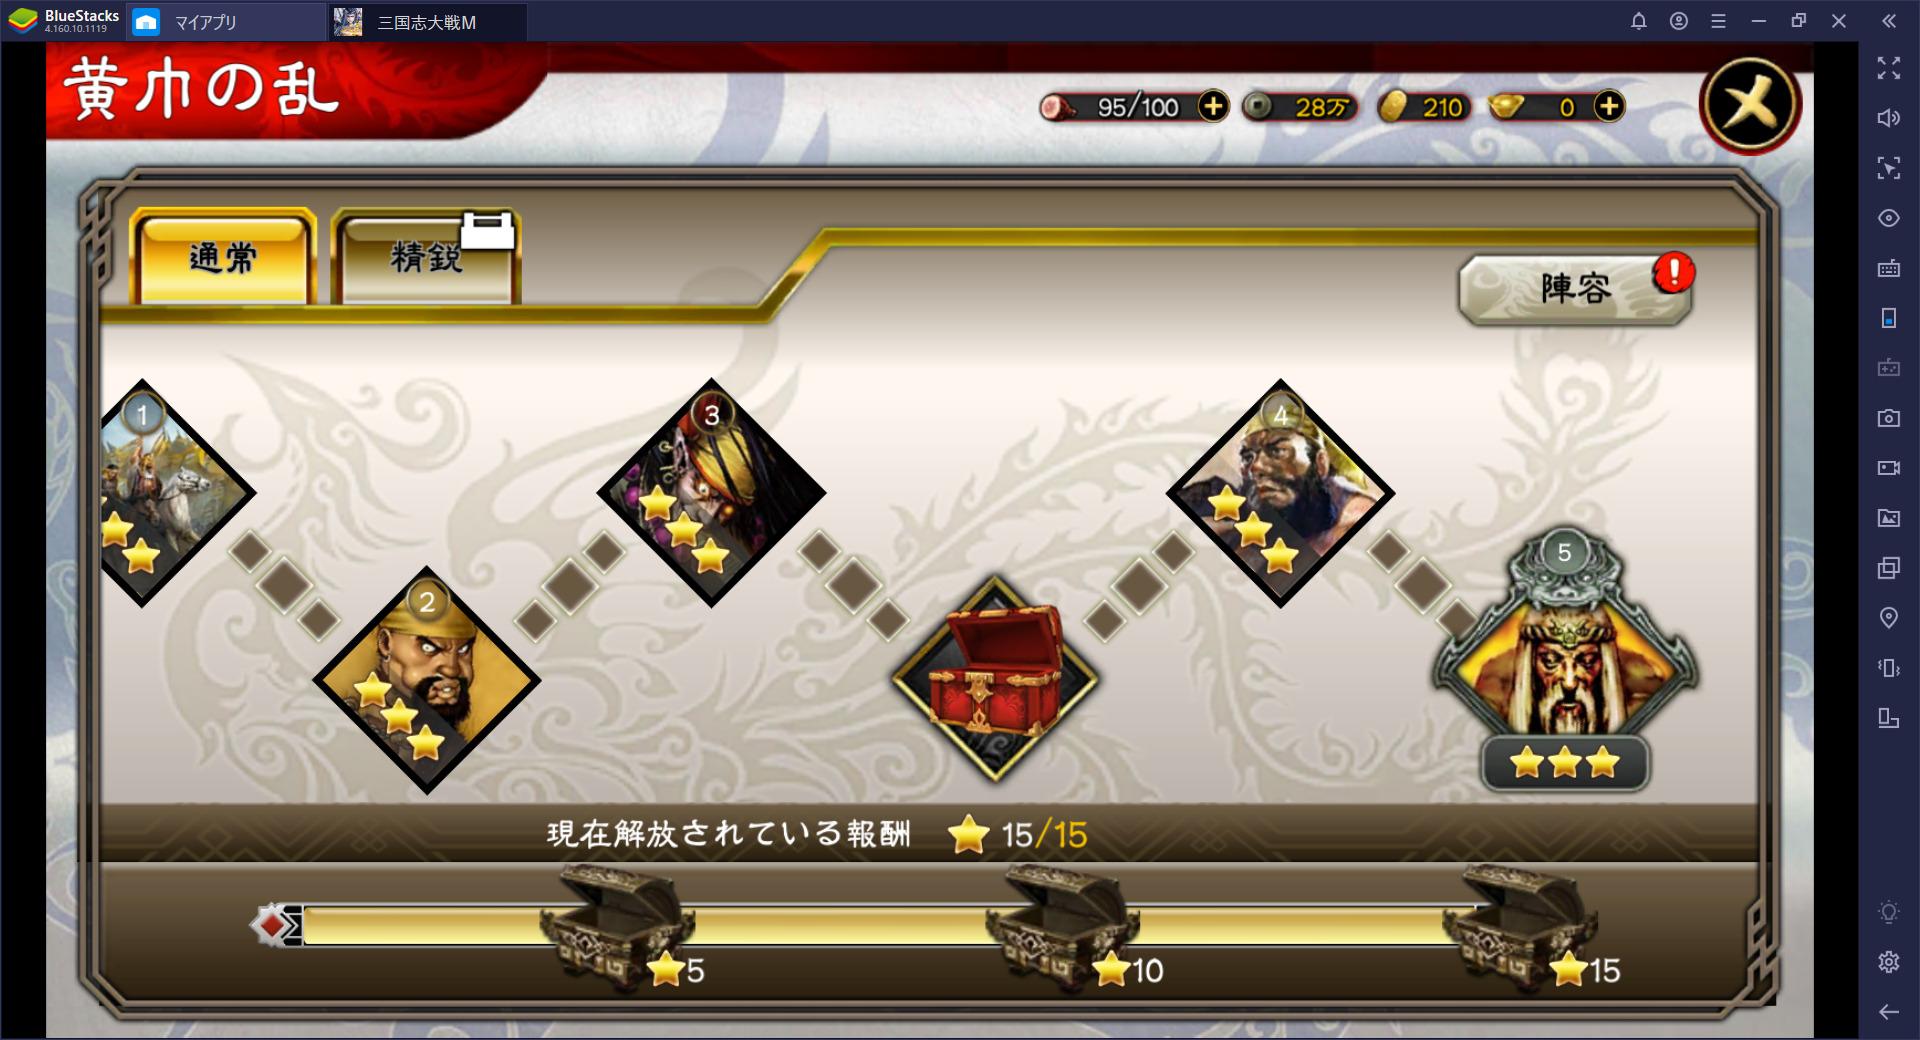 BlueStacksを使ってPCで『三国志大戦M:超本格戦略型カードRPG』を遊ぼう